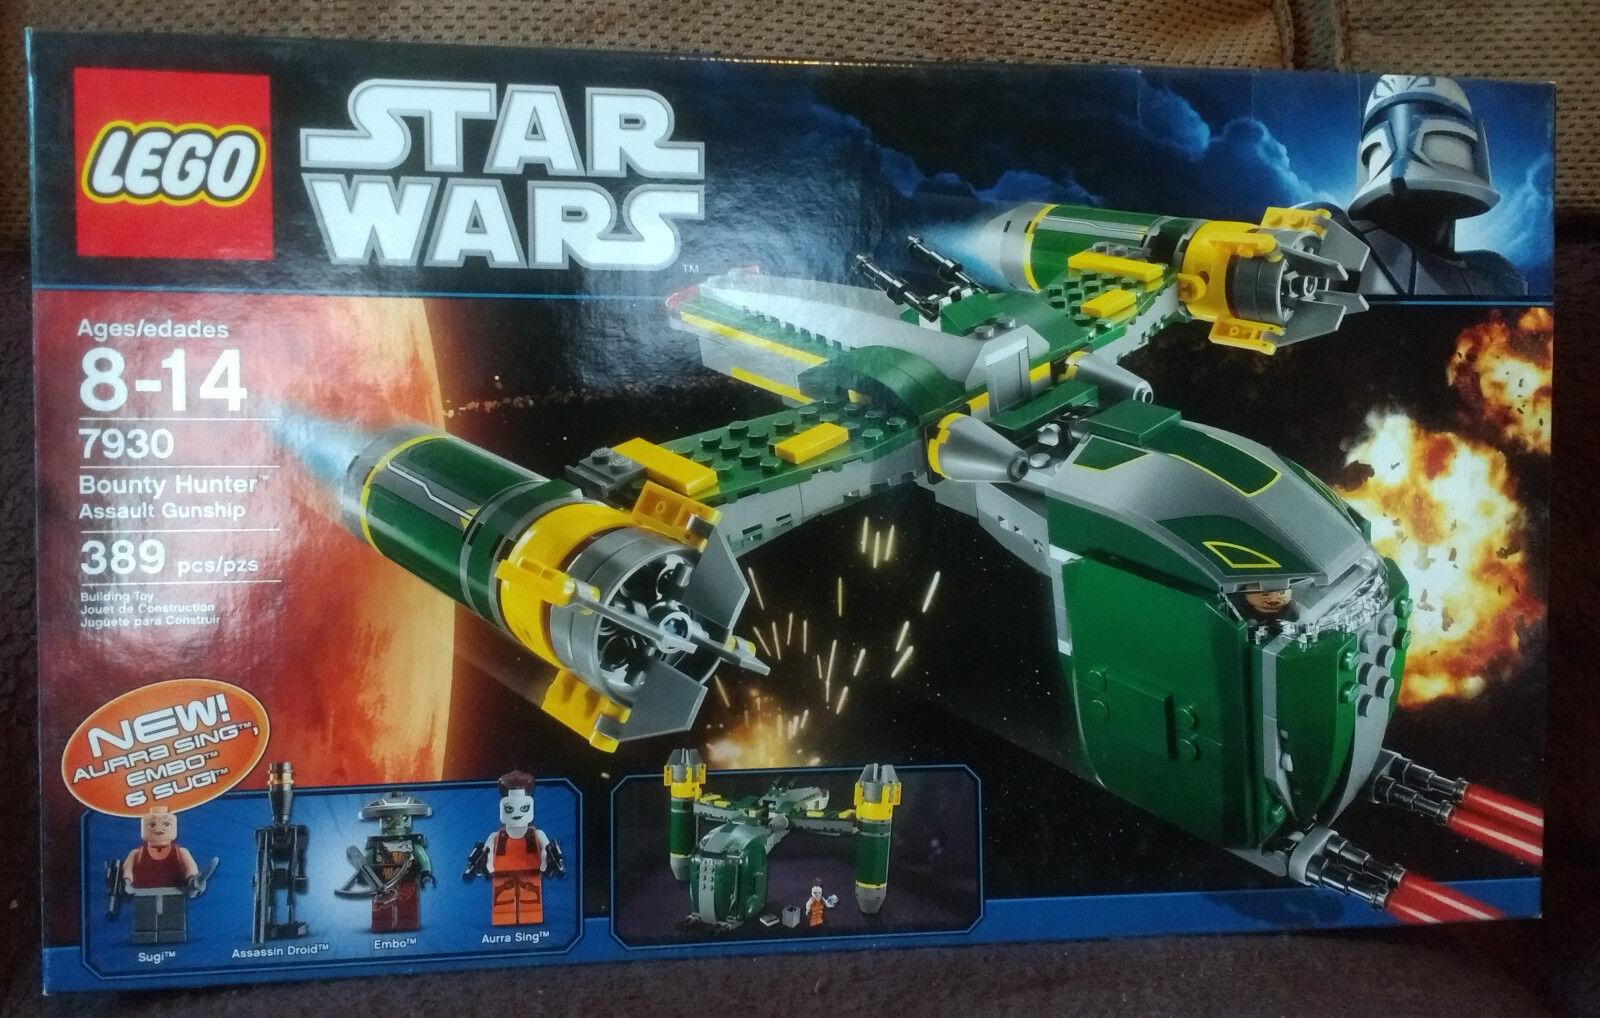 Lego Star Wars Bounty Hunter Assault Gunship (7930) New MISB